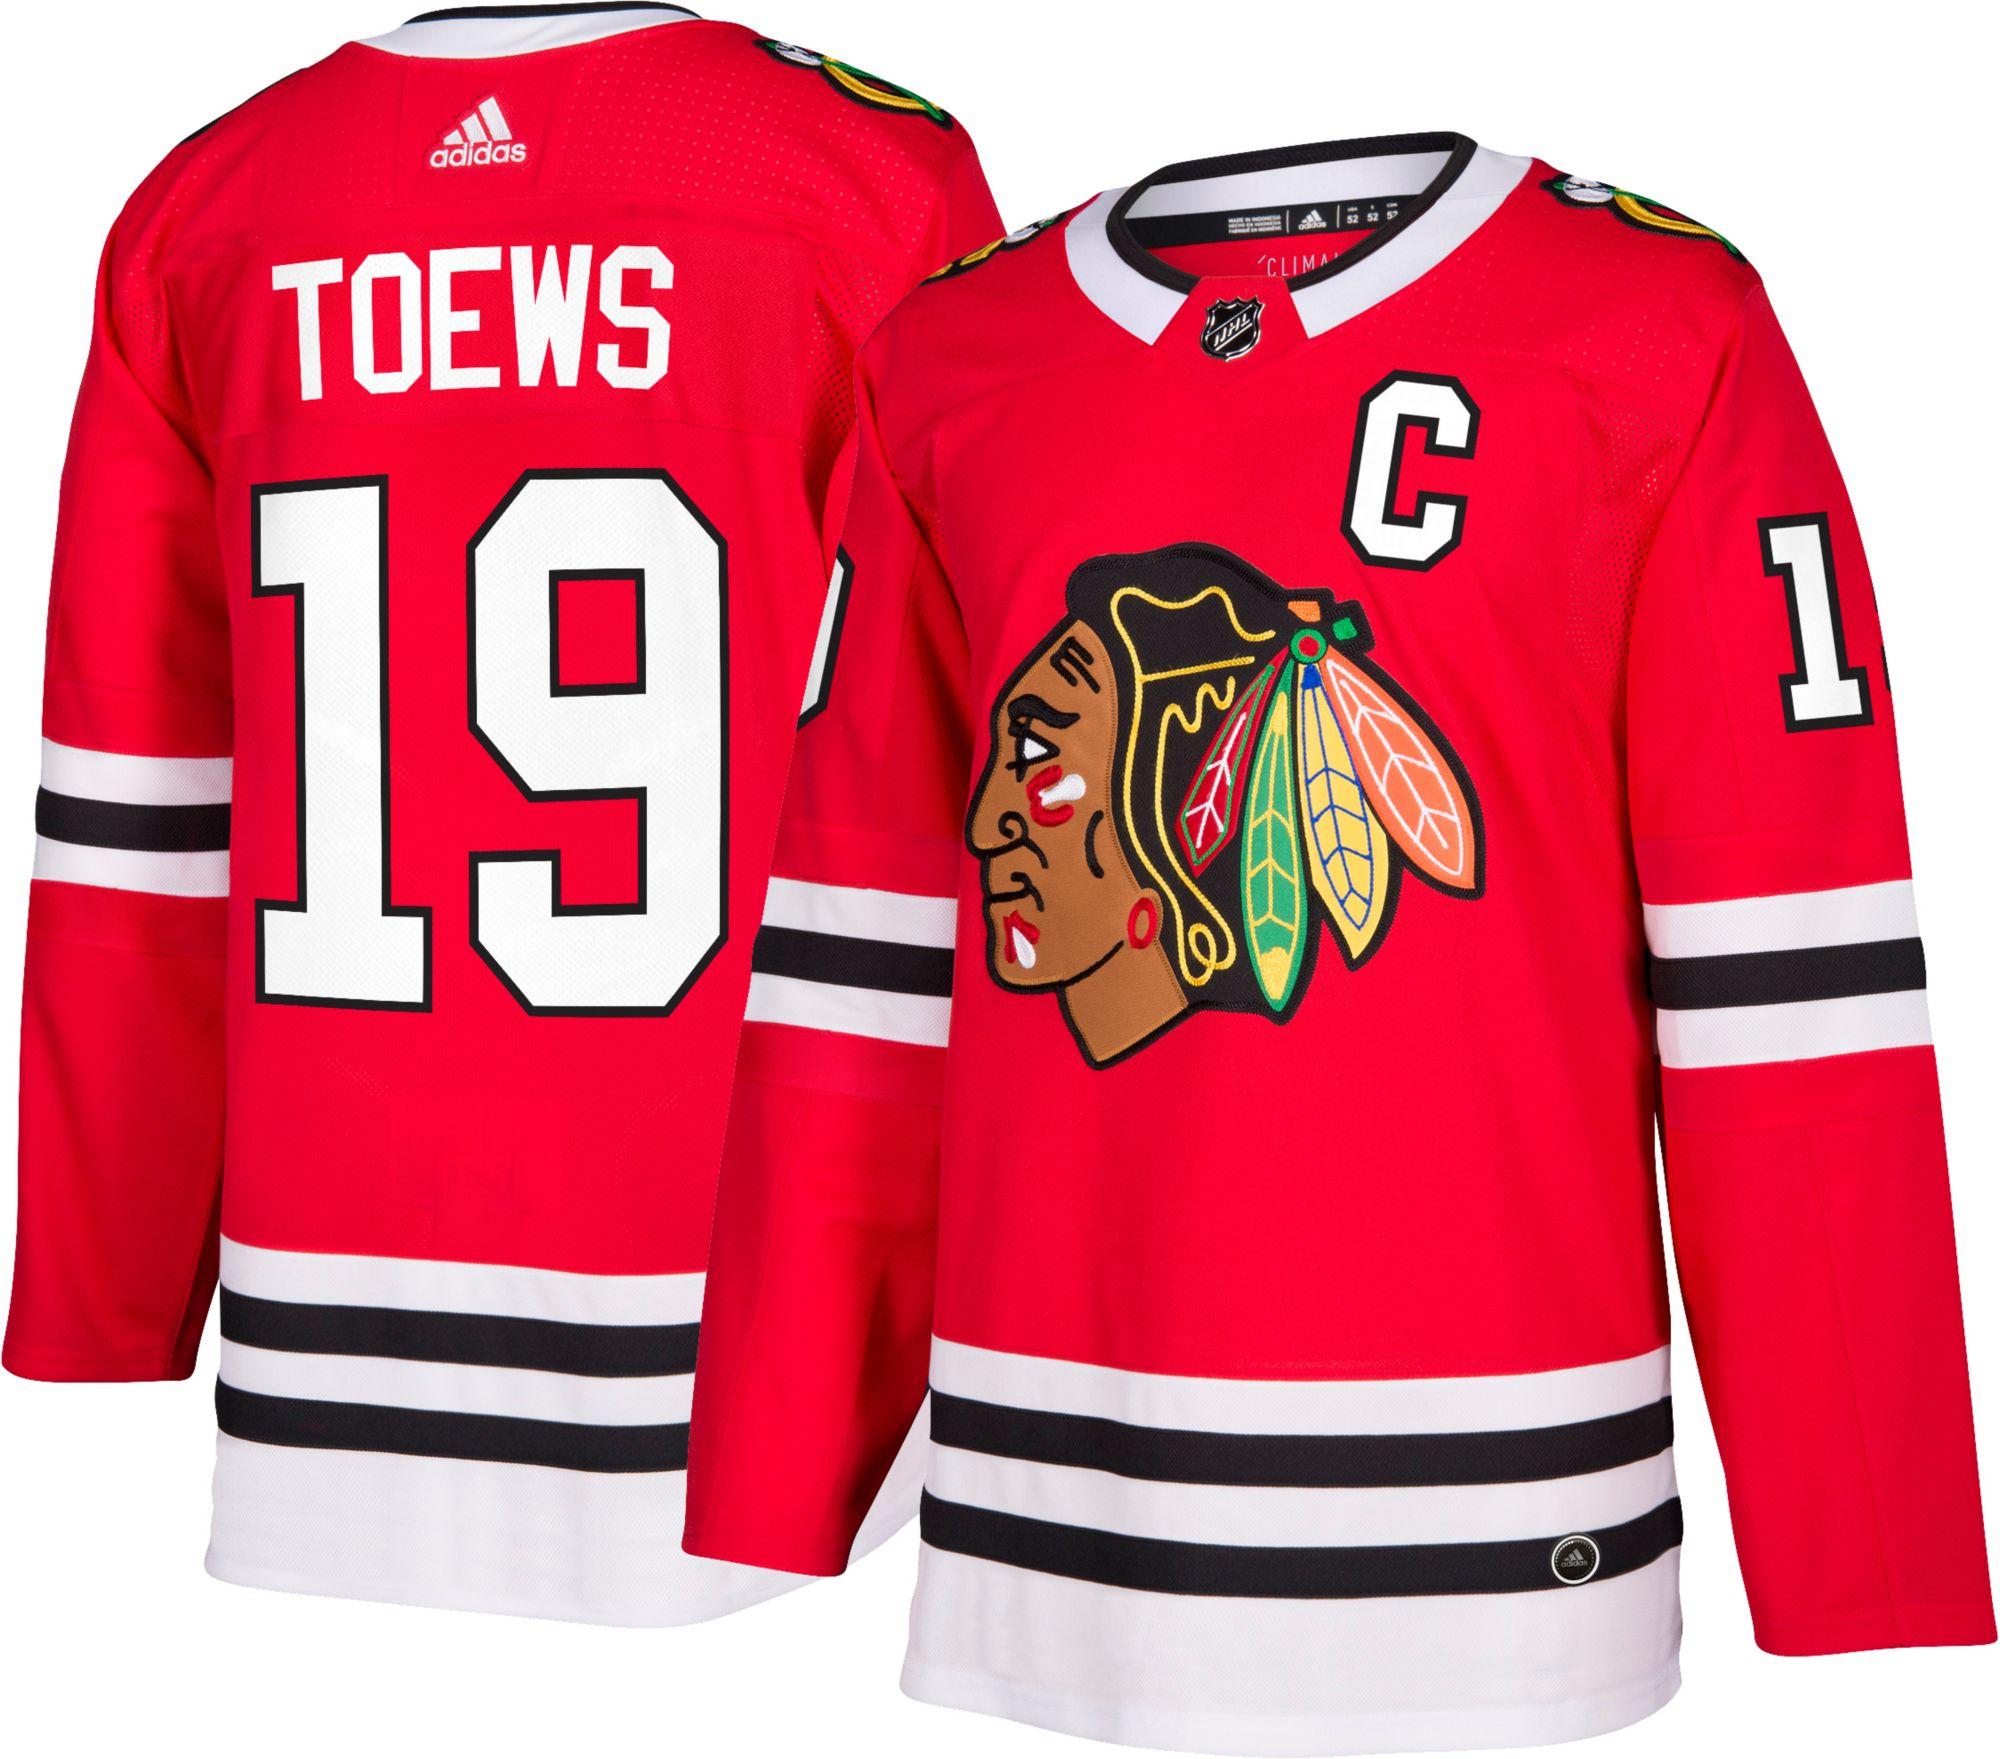 49cb306d adidas Men's Chicago Blackhawks Jonathan Toews #19 Authentic Pro ...